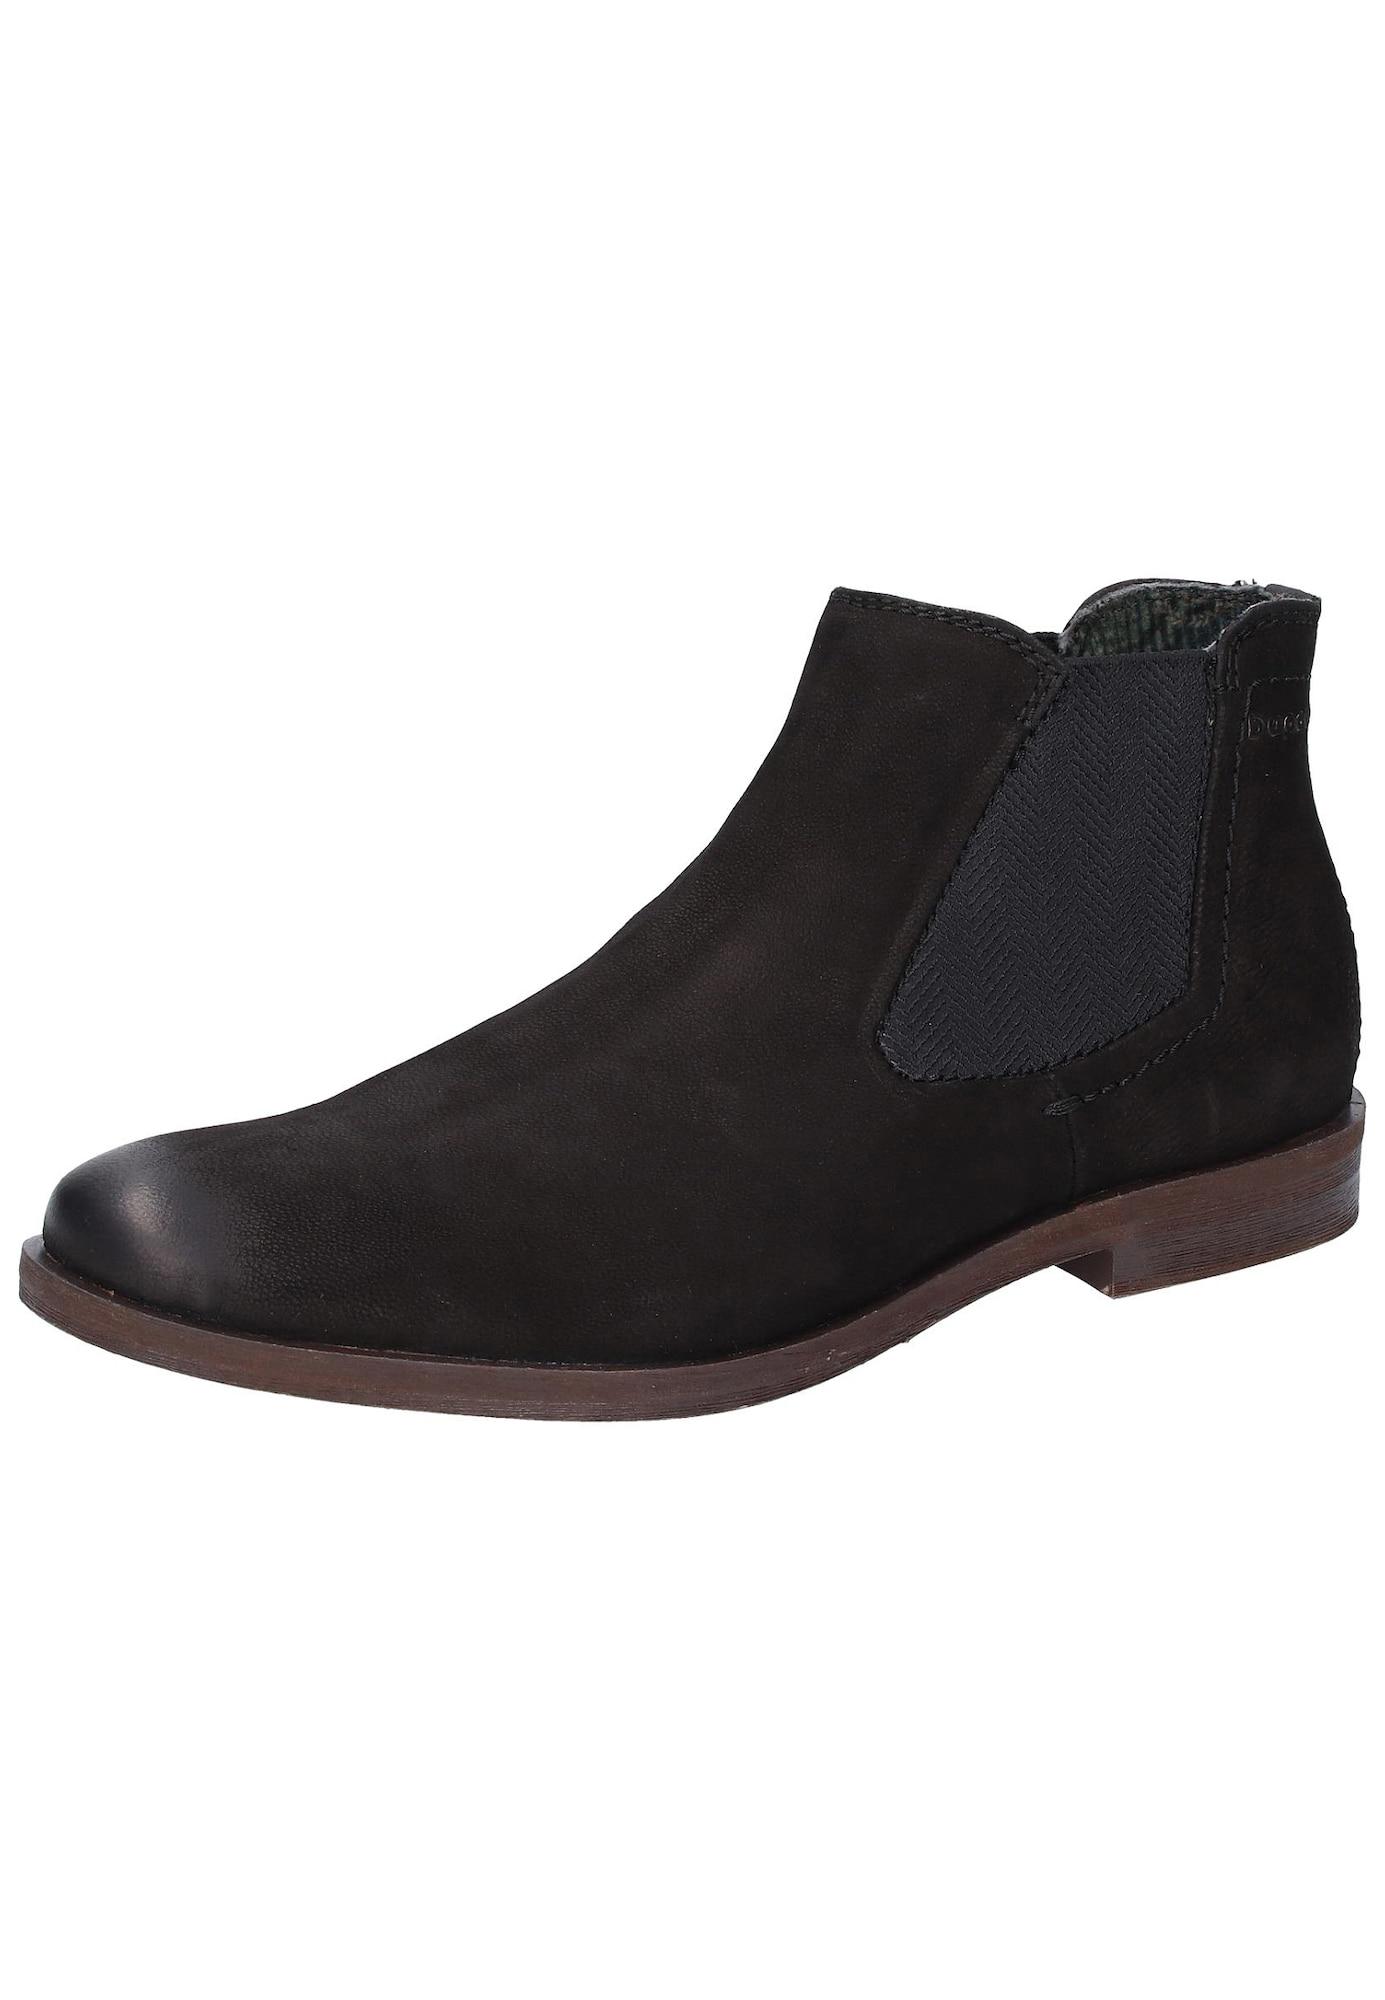 Chelsea boty Abramo černá Bugatti